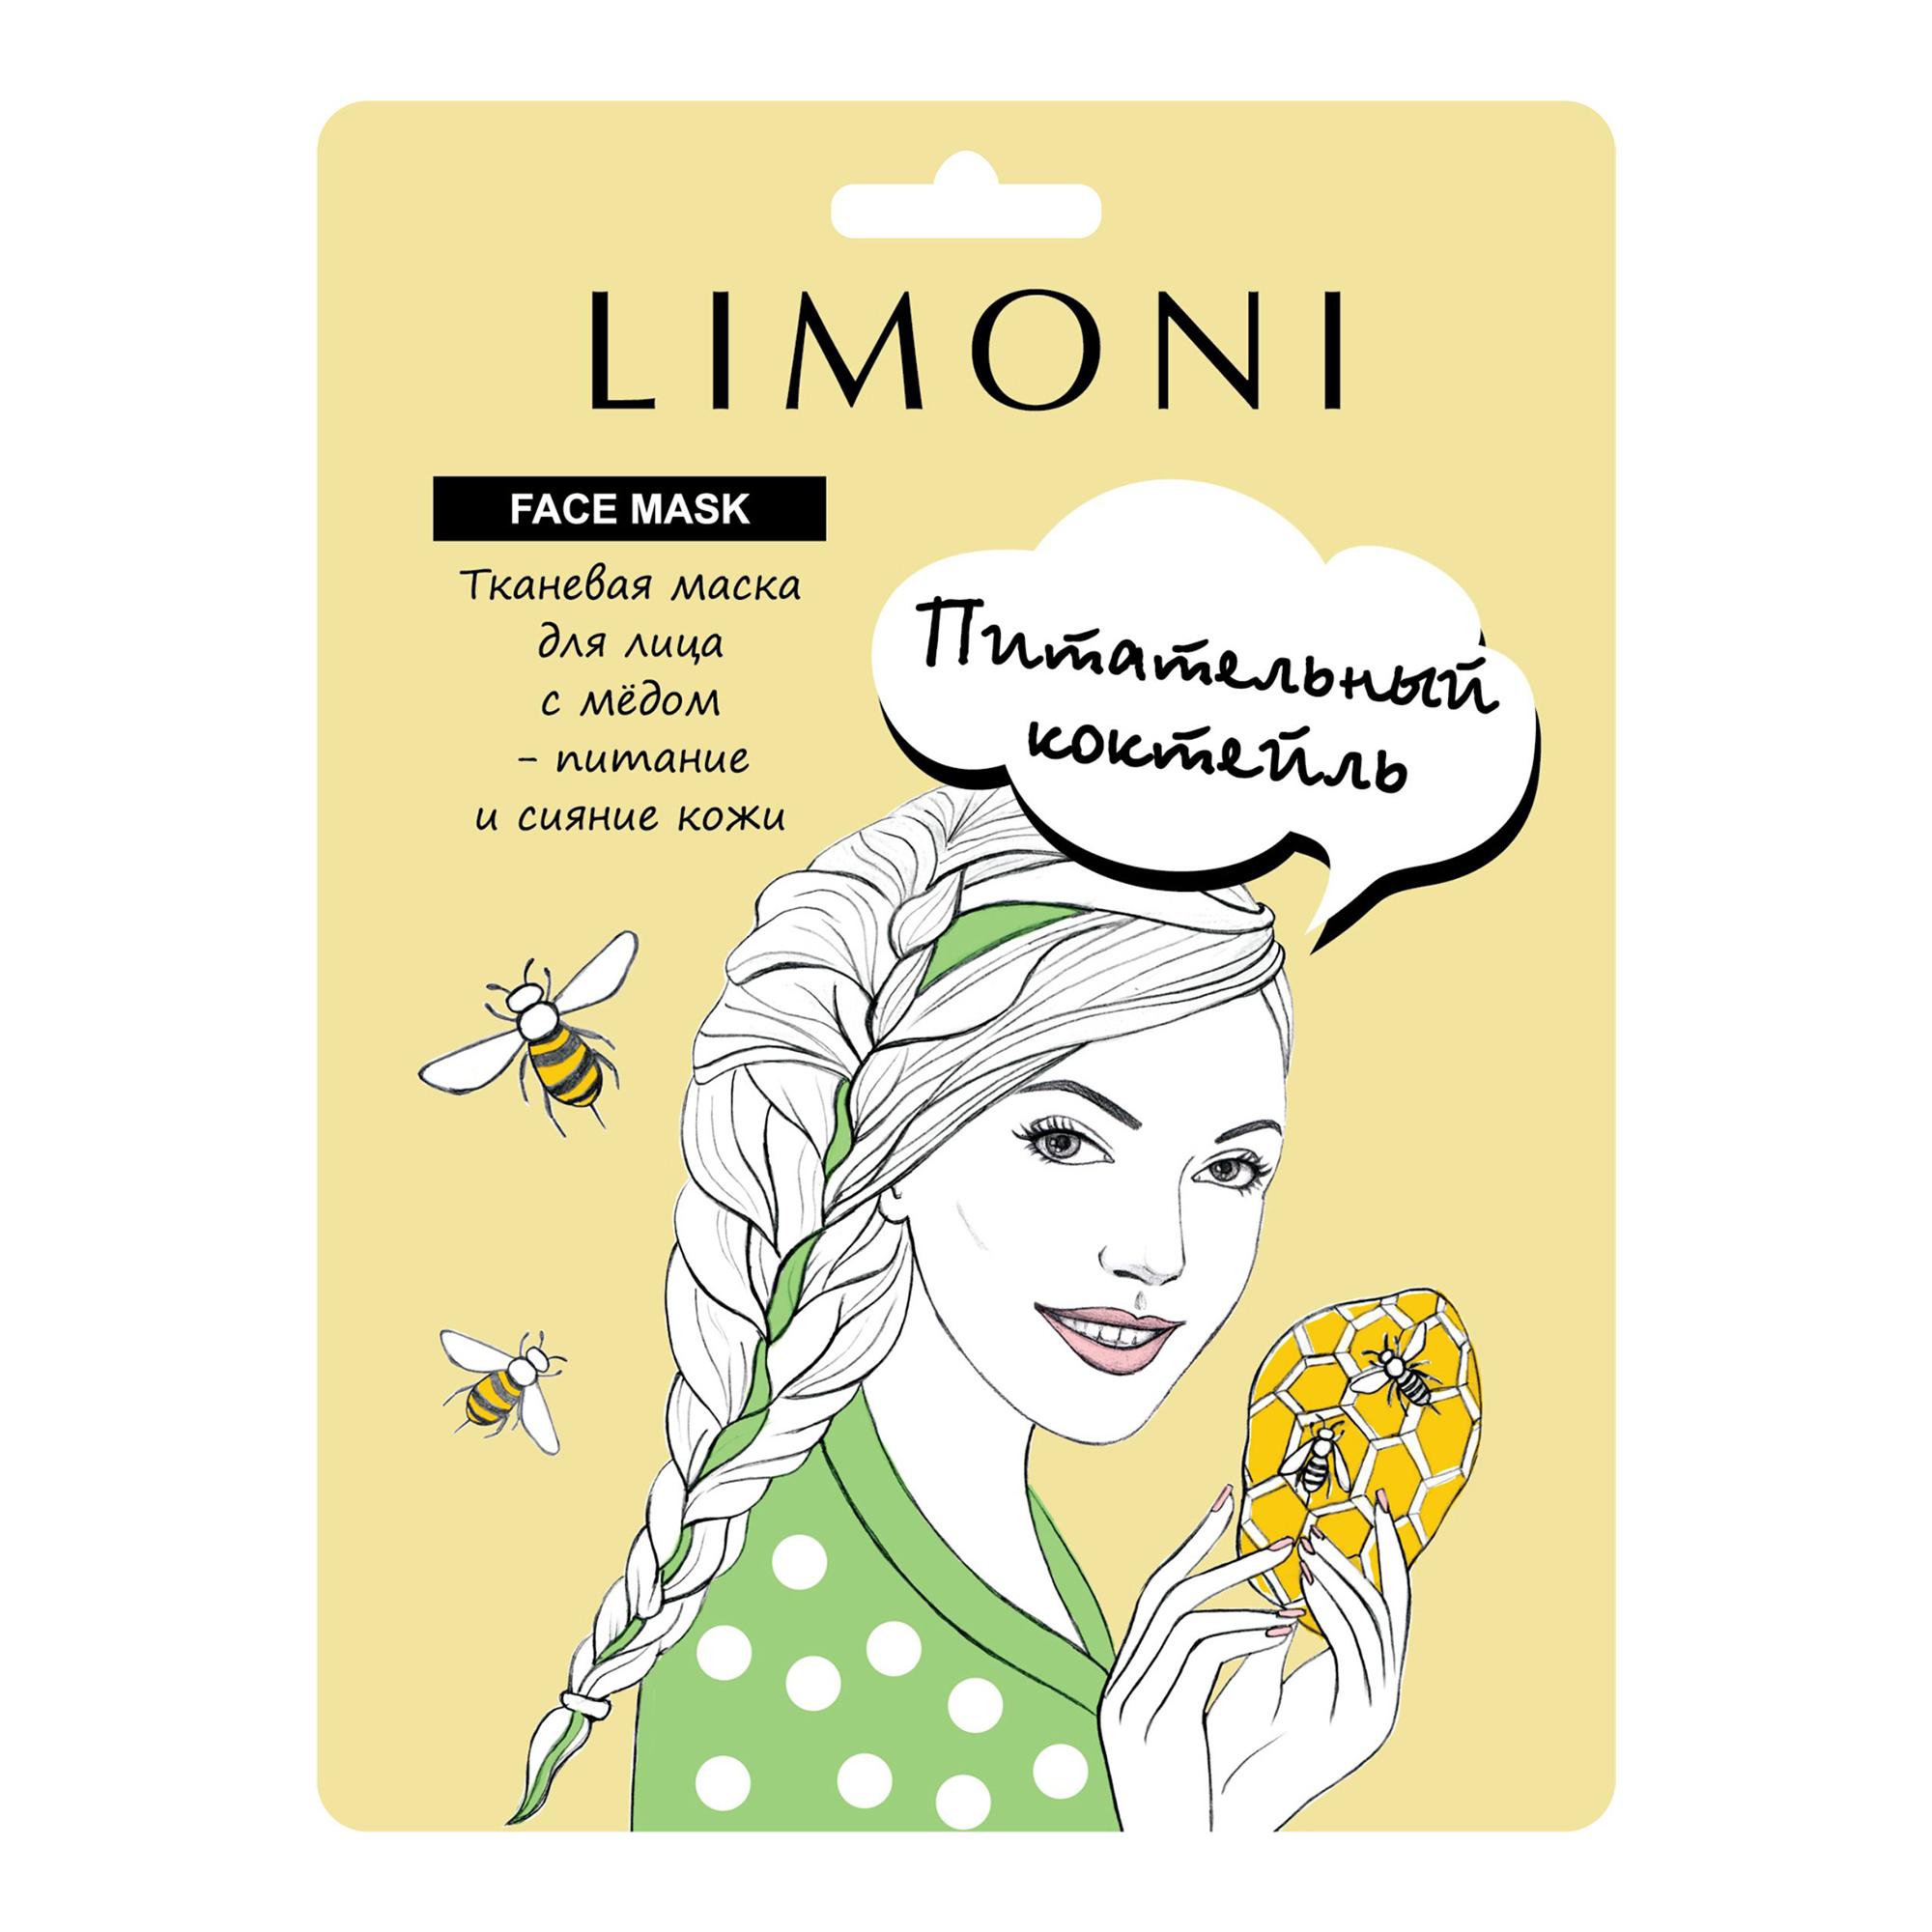 LIMONI Маска для лица питательная с медом Sheet mask with honey extract / SHEET MASK 20гр